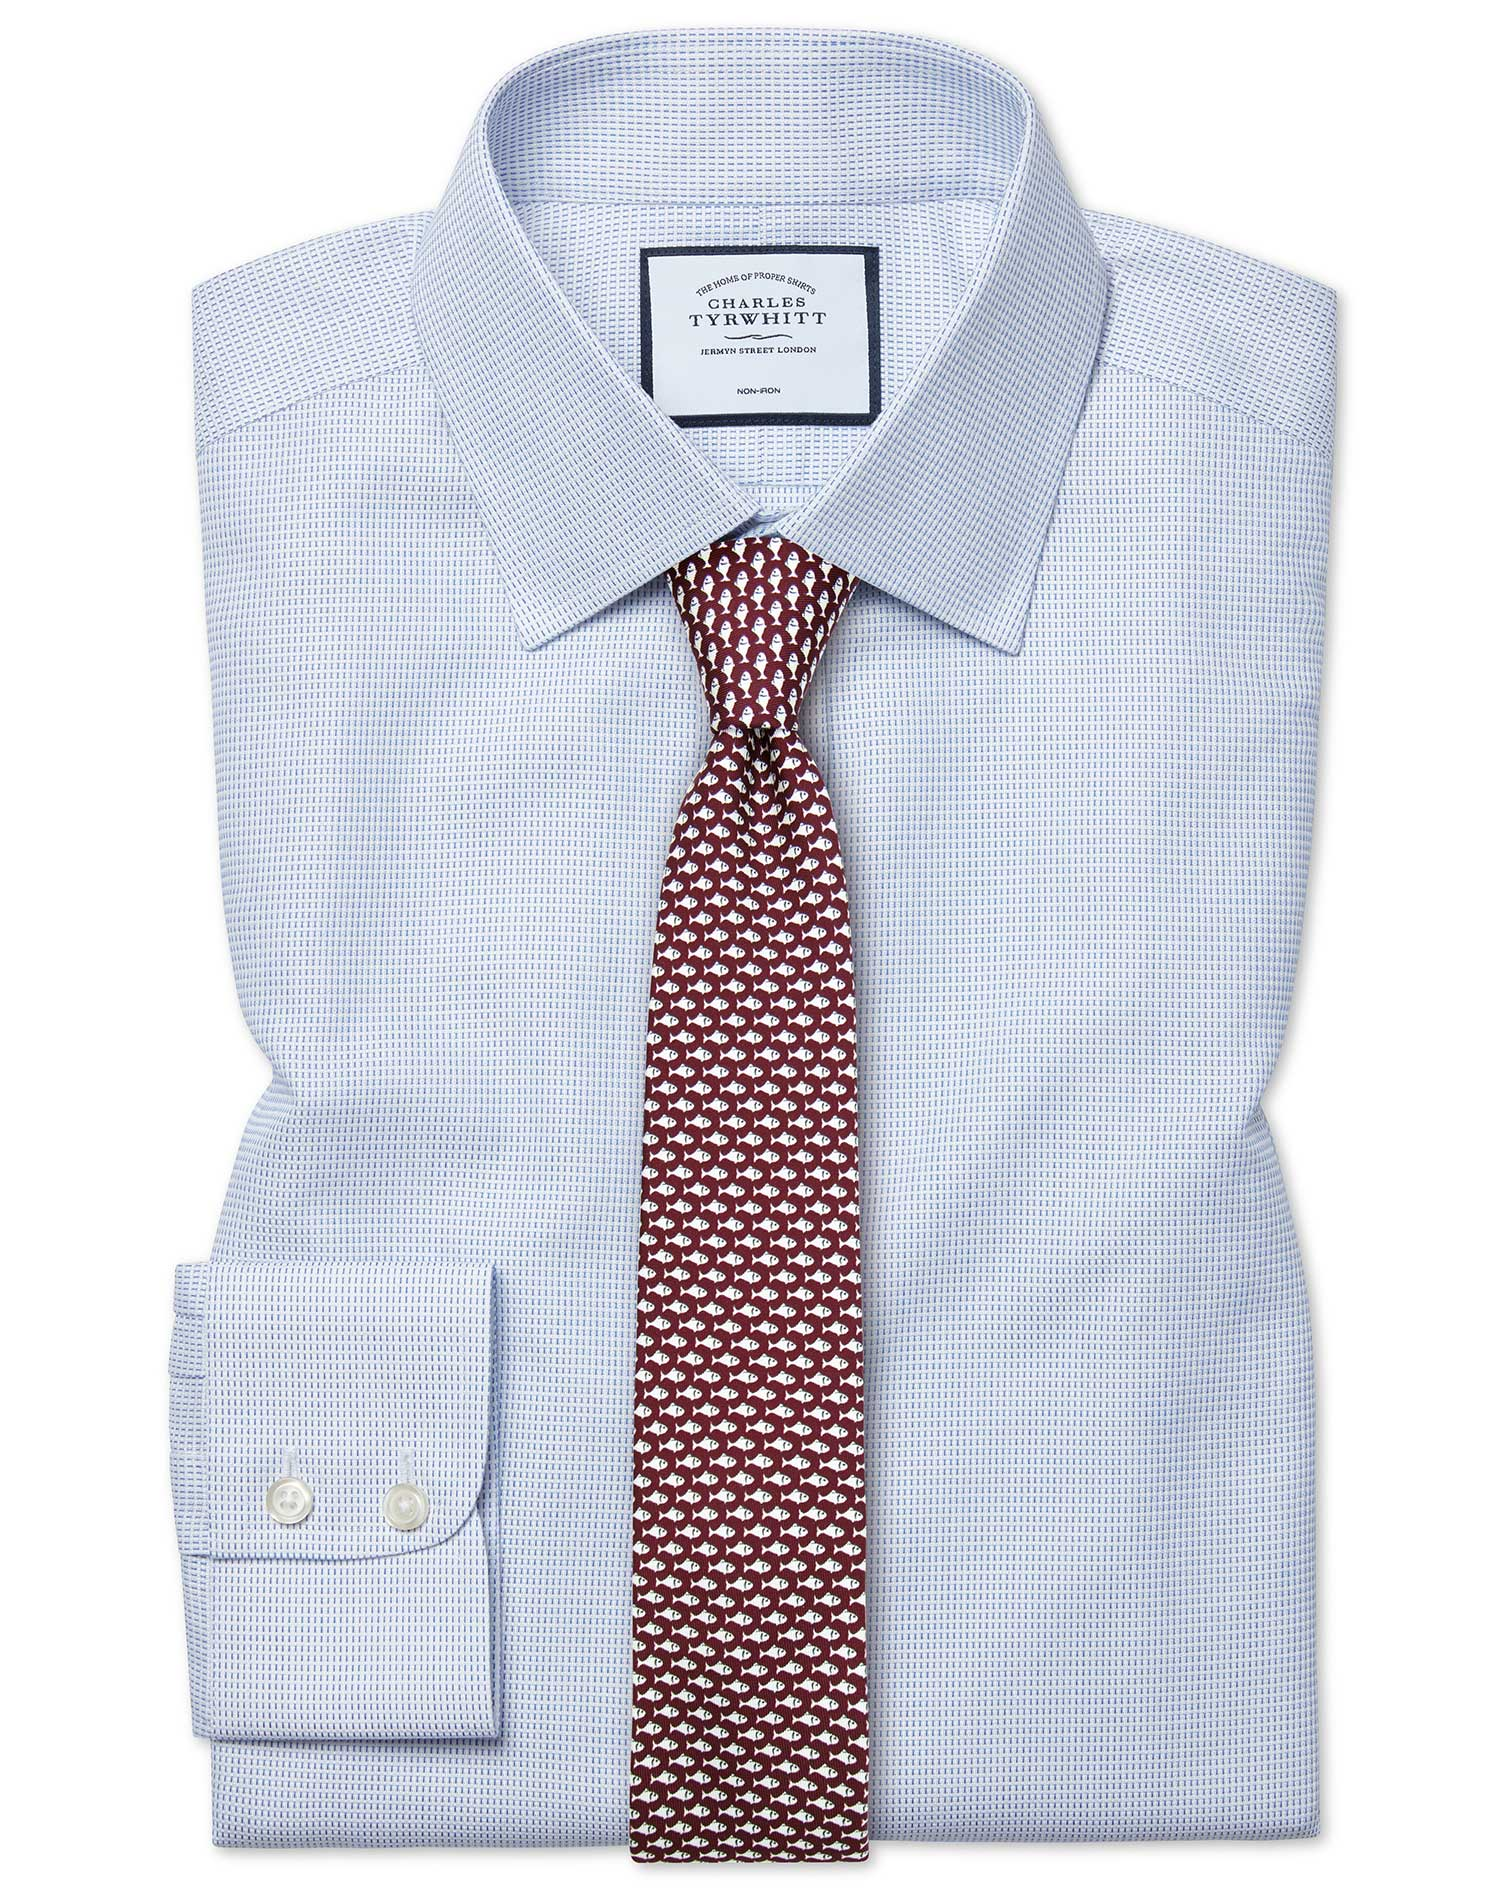 Cotton Extra Slim Fit Non-Iron Dash Weave Blue Shirt